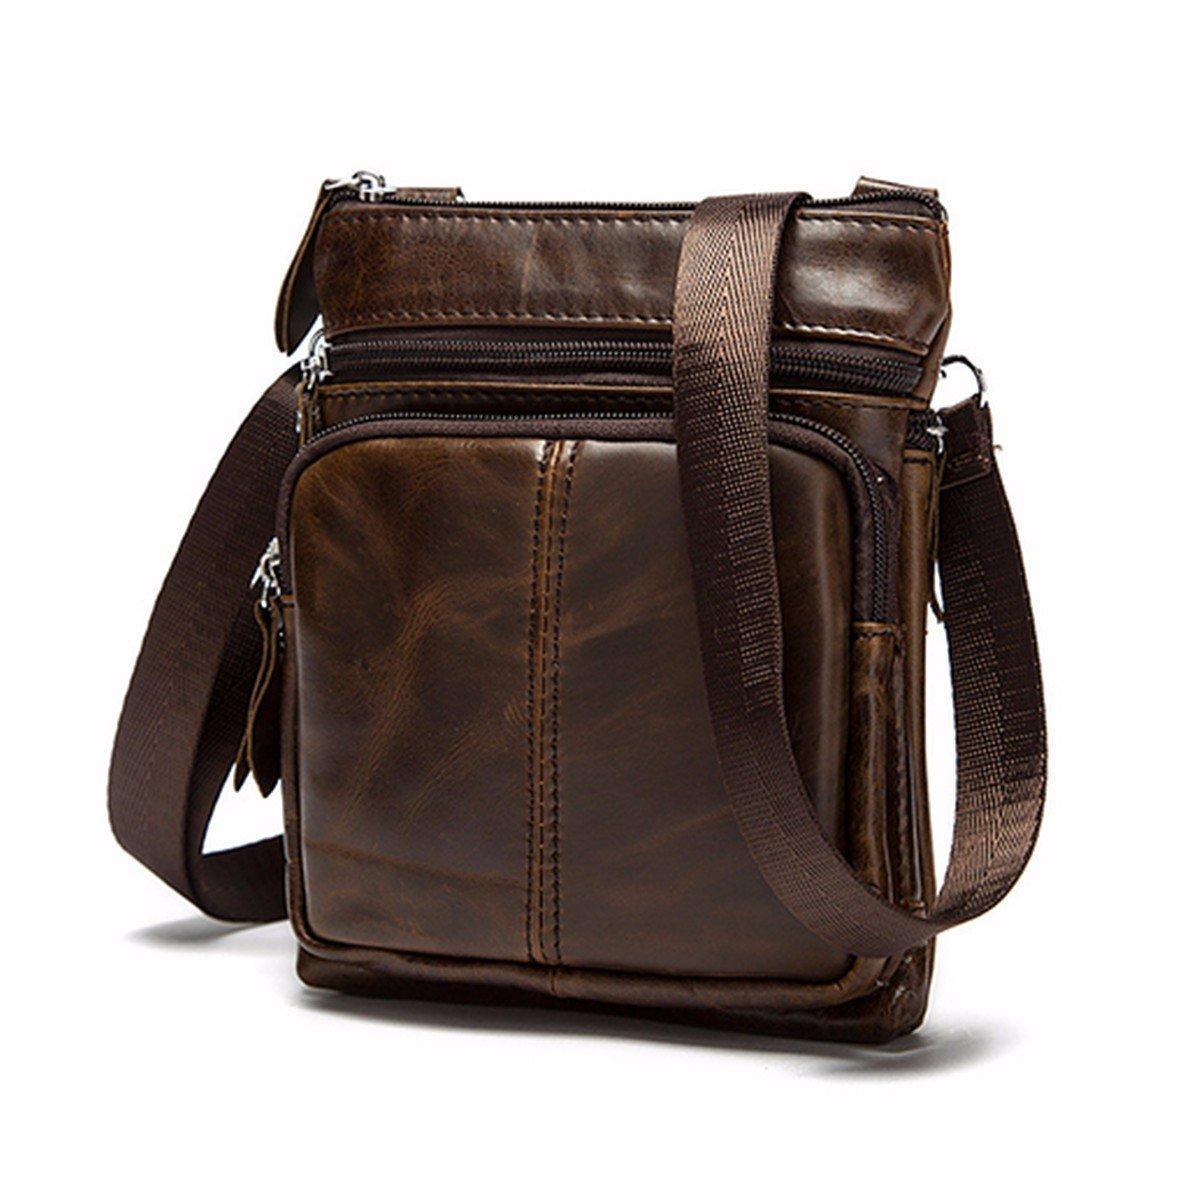 OURBAG Casual Men Vintage Shoulder Bag Messenger Crossbody Bags Handbag Coffee